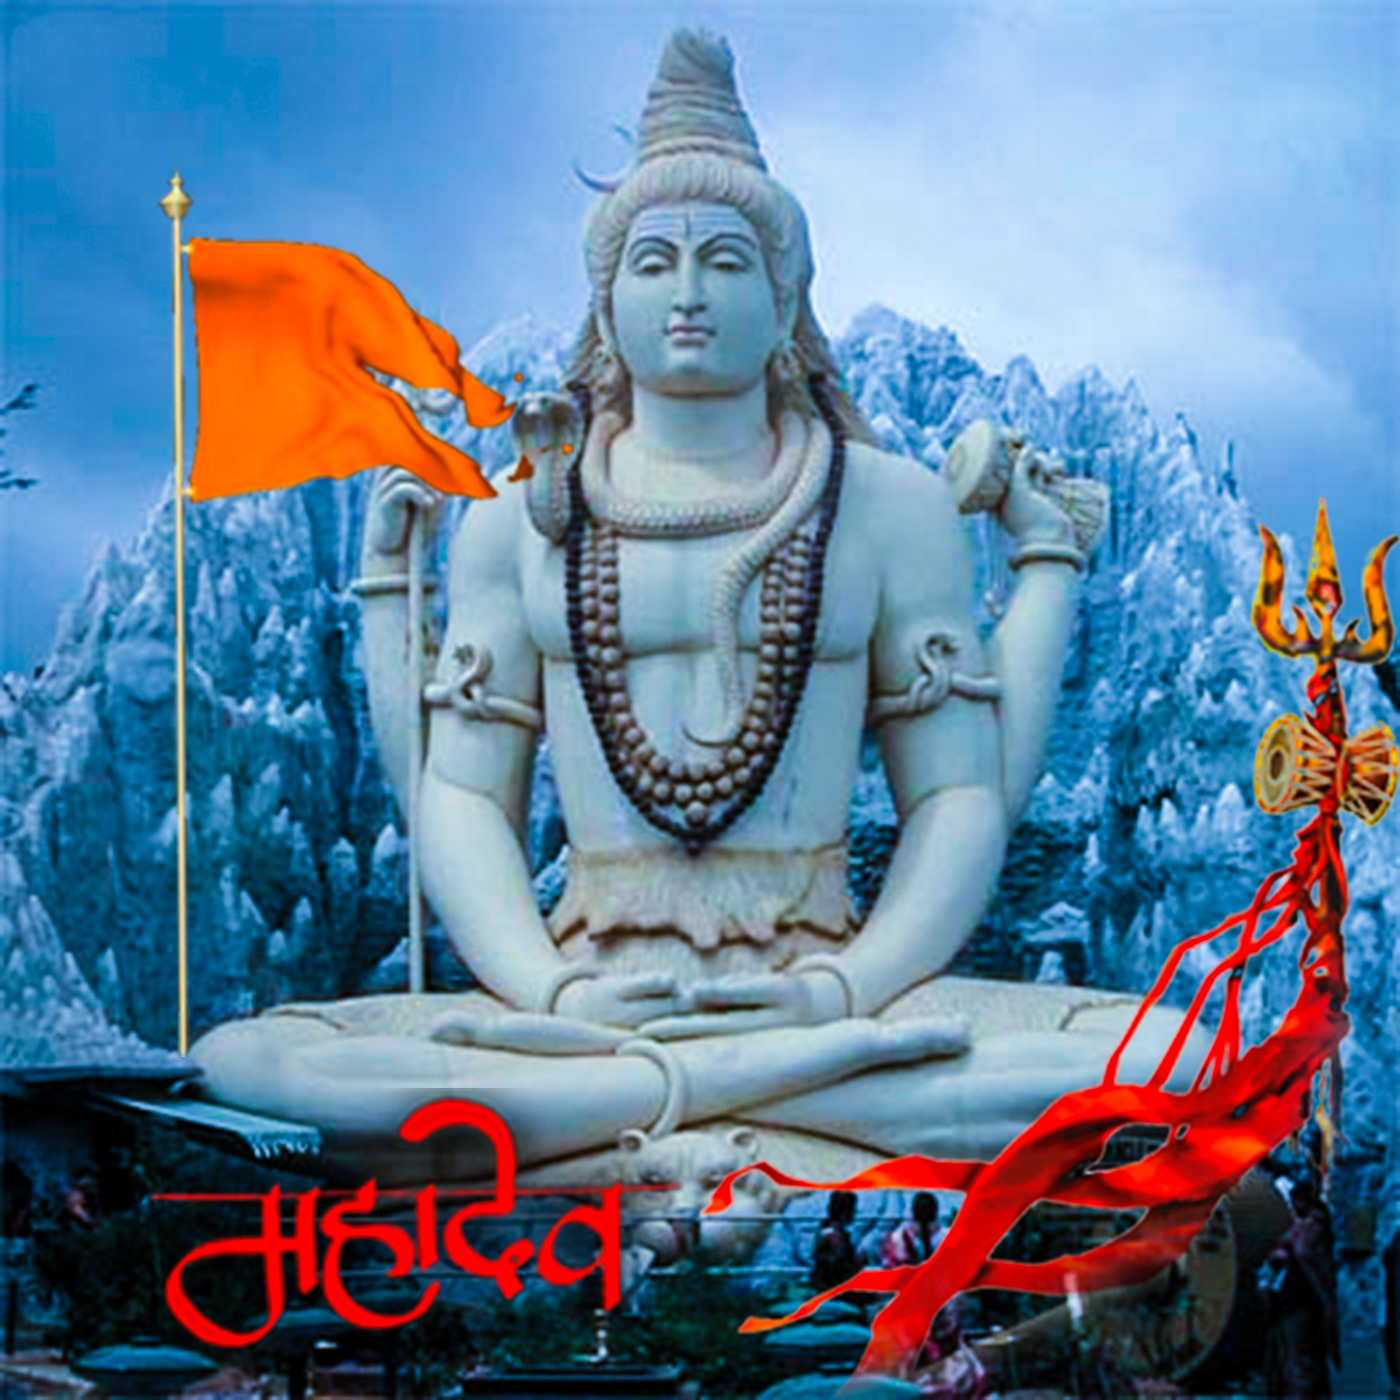 maha shivratri editing backgrounds 4